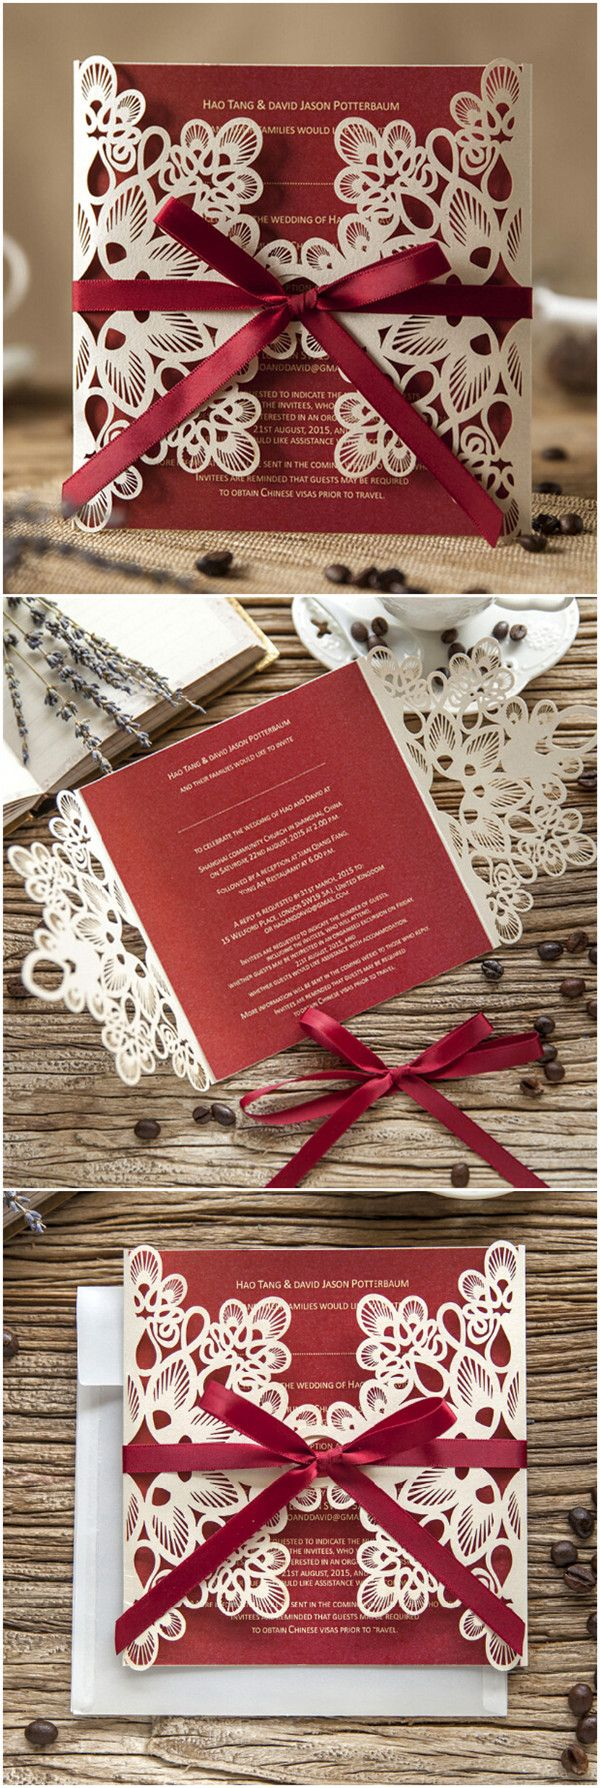 62 best wedding invites 2016 images on Pinterest | Mariage, Invites ...